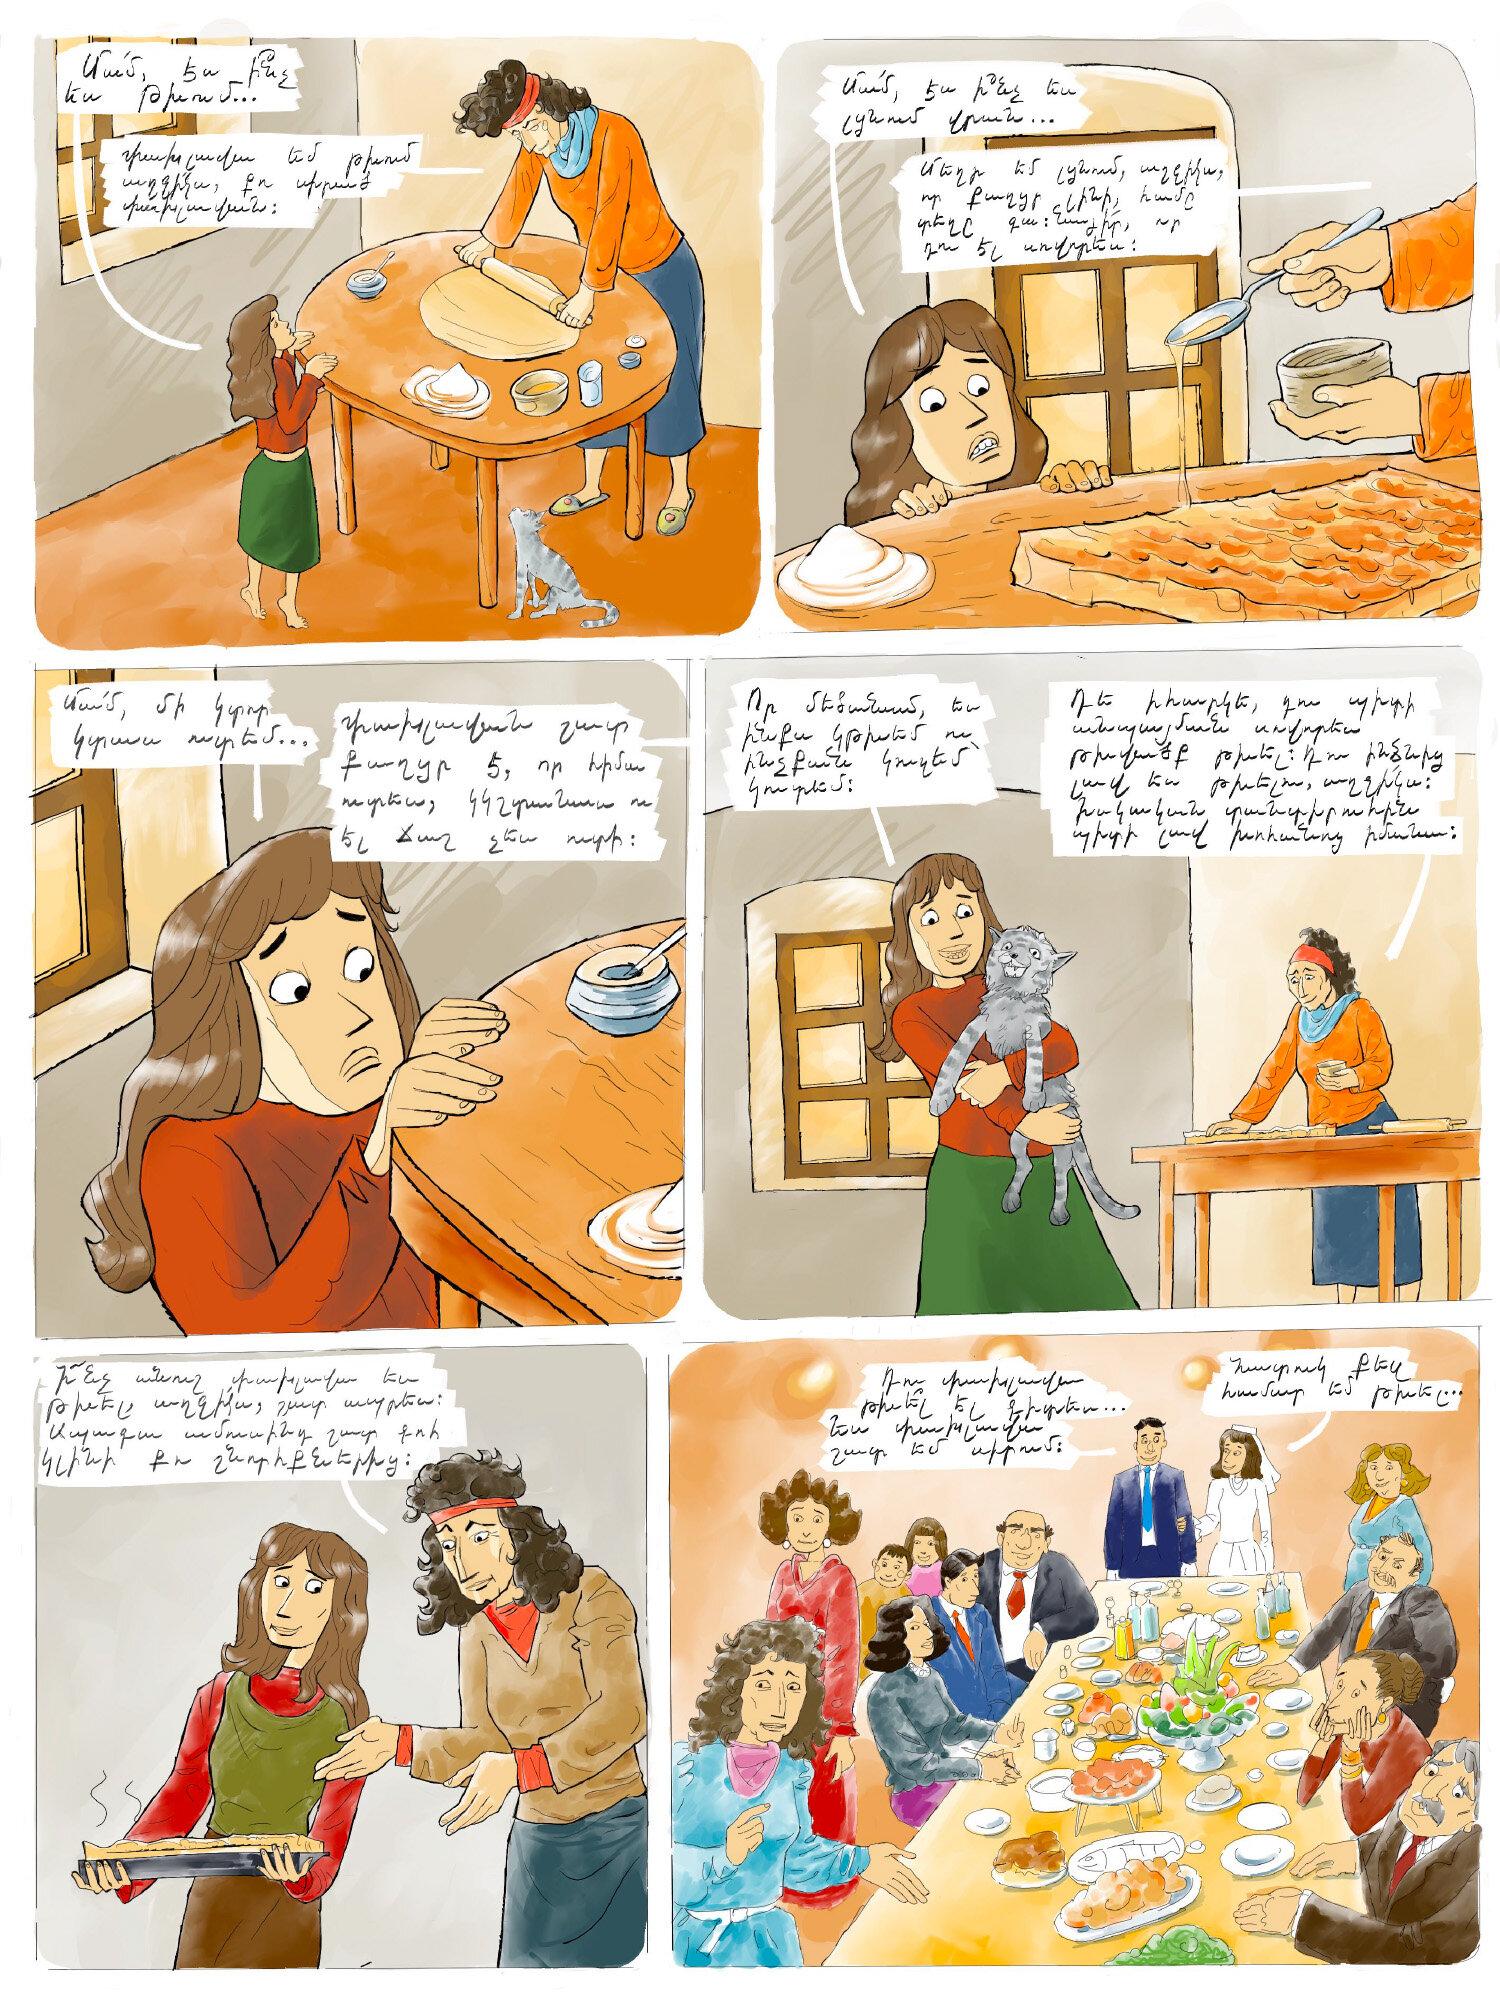 paxlava-comics-2.jpg